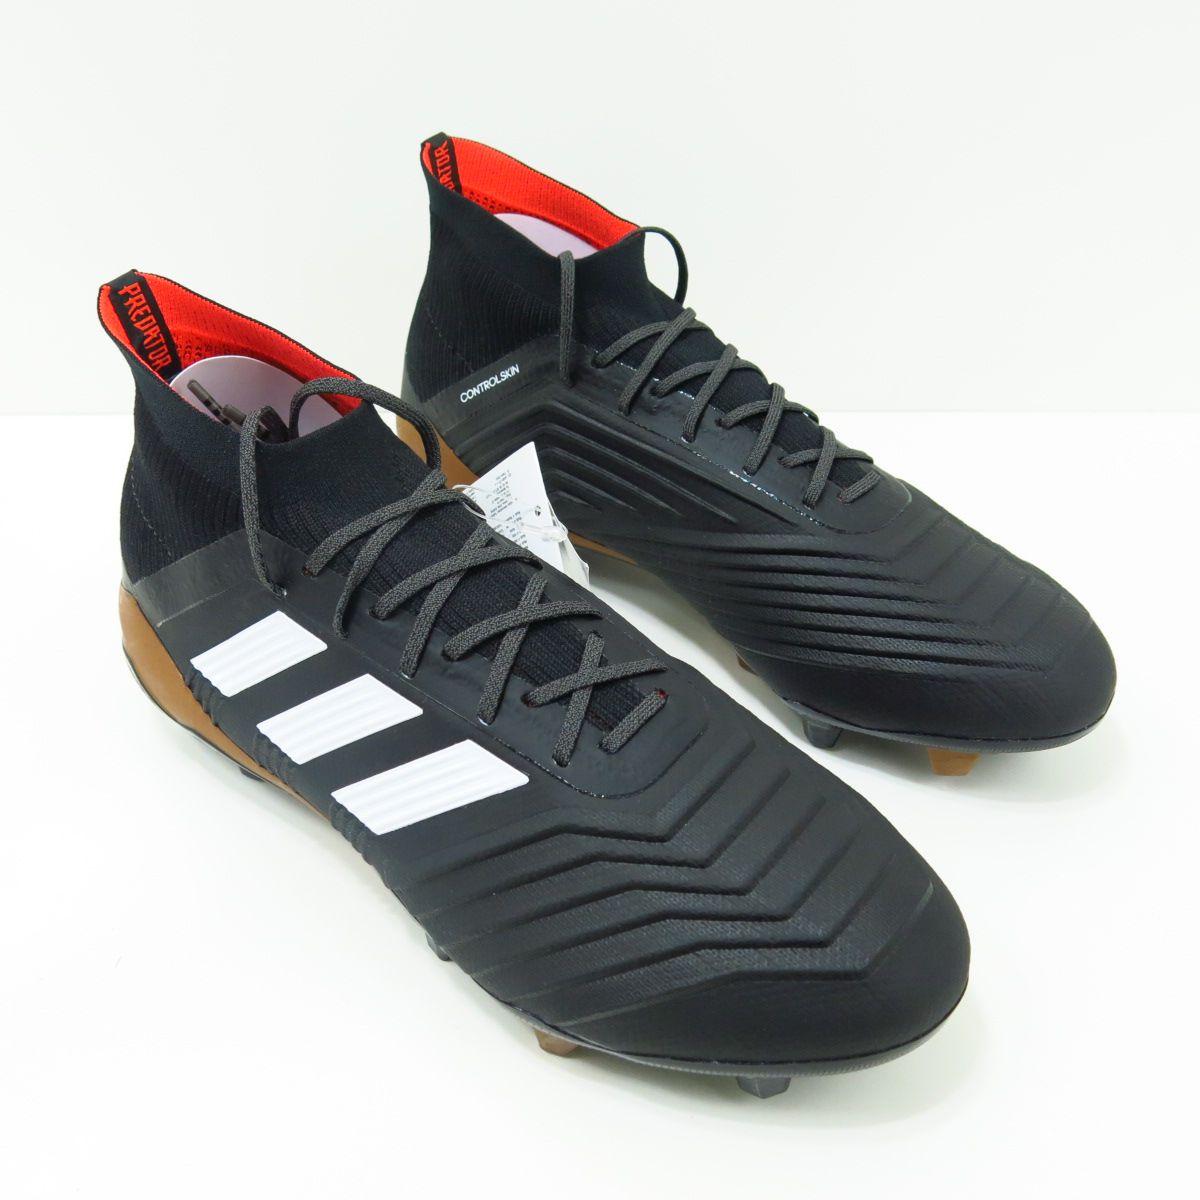 Chuteira Adidas Predator 18.1 FG Elite